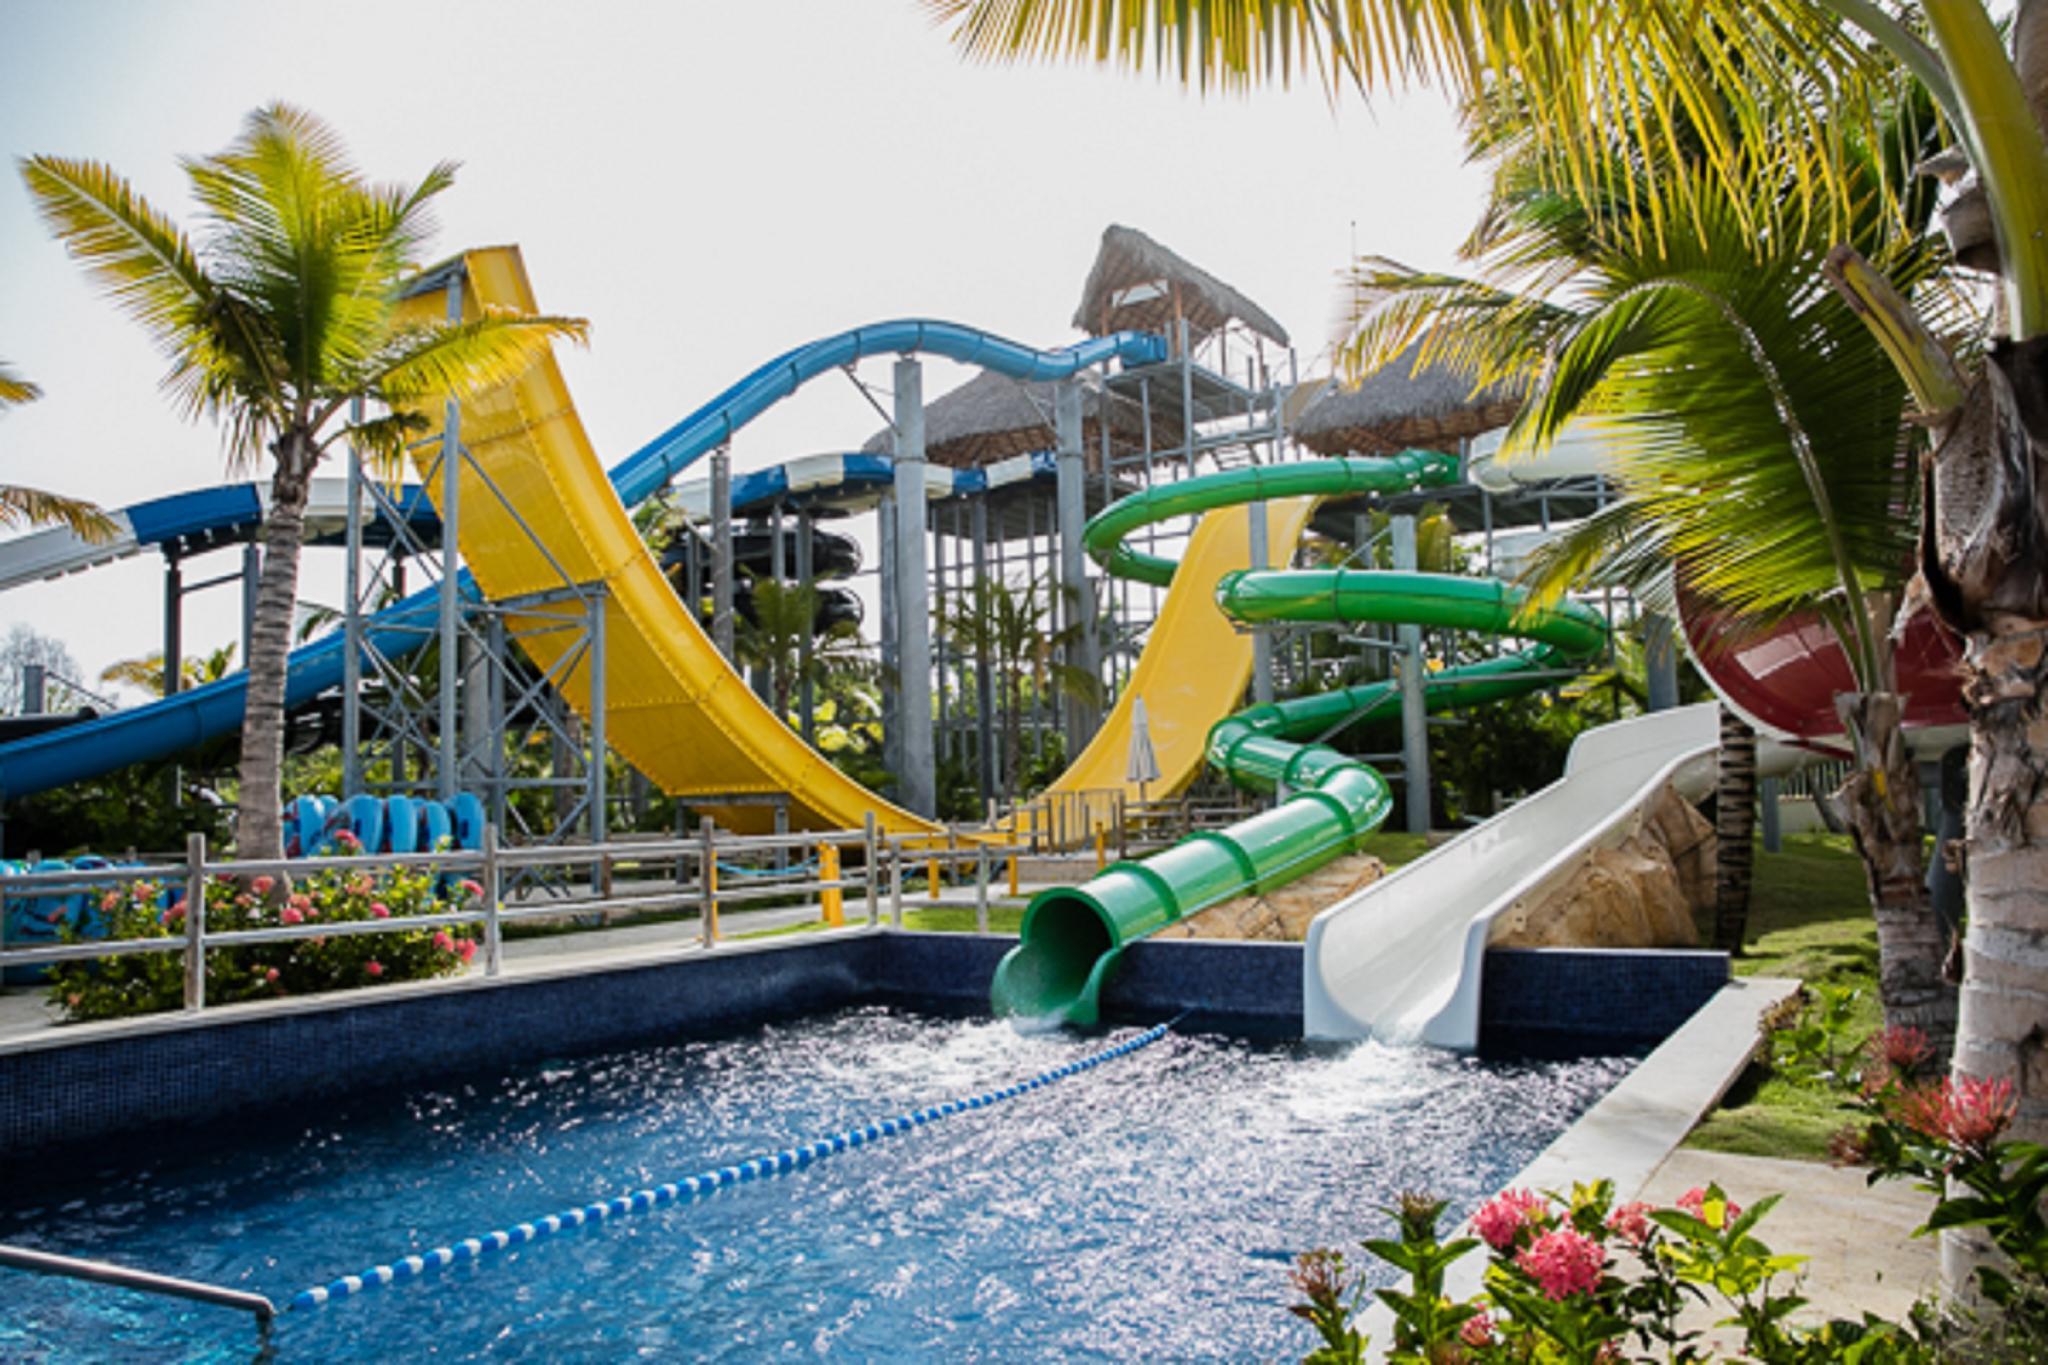 Grand Memories Splash Punta Cana   All Inclusive